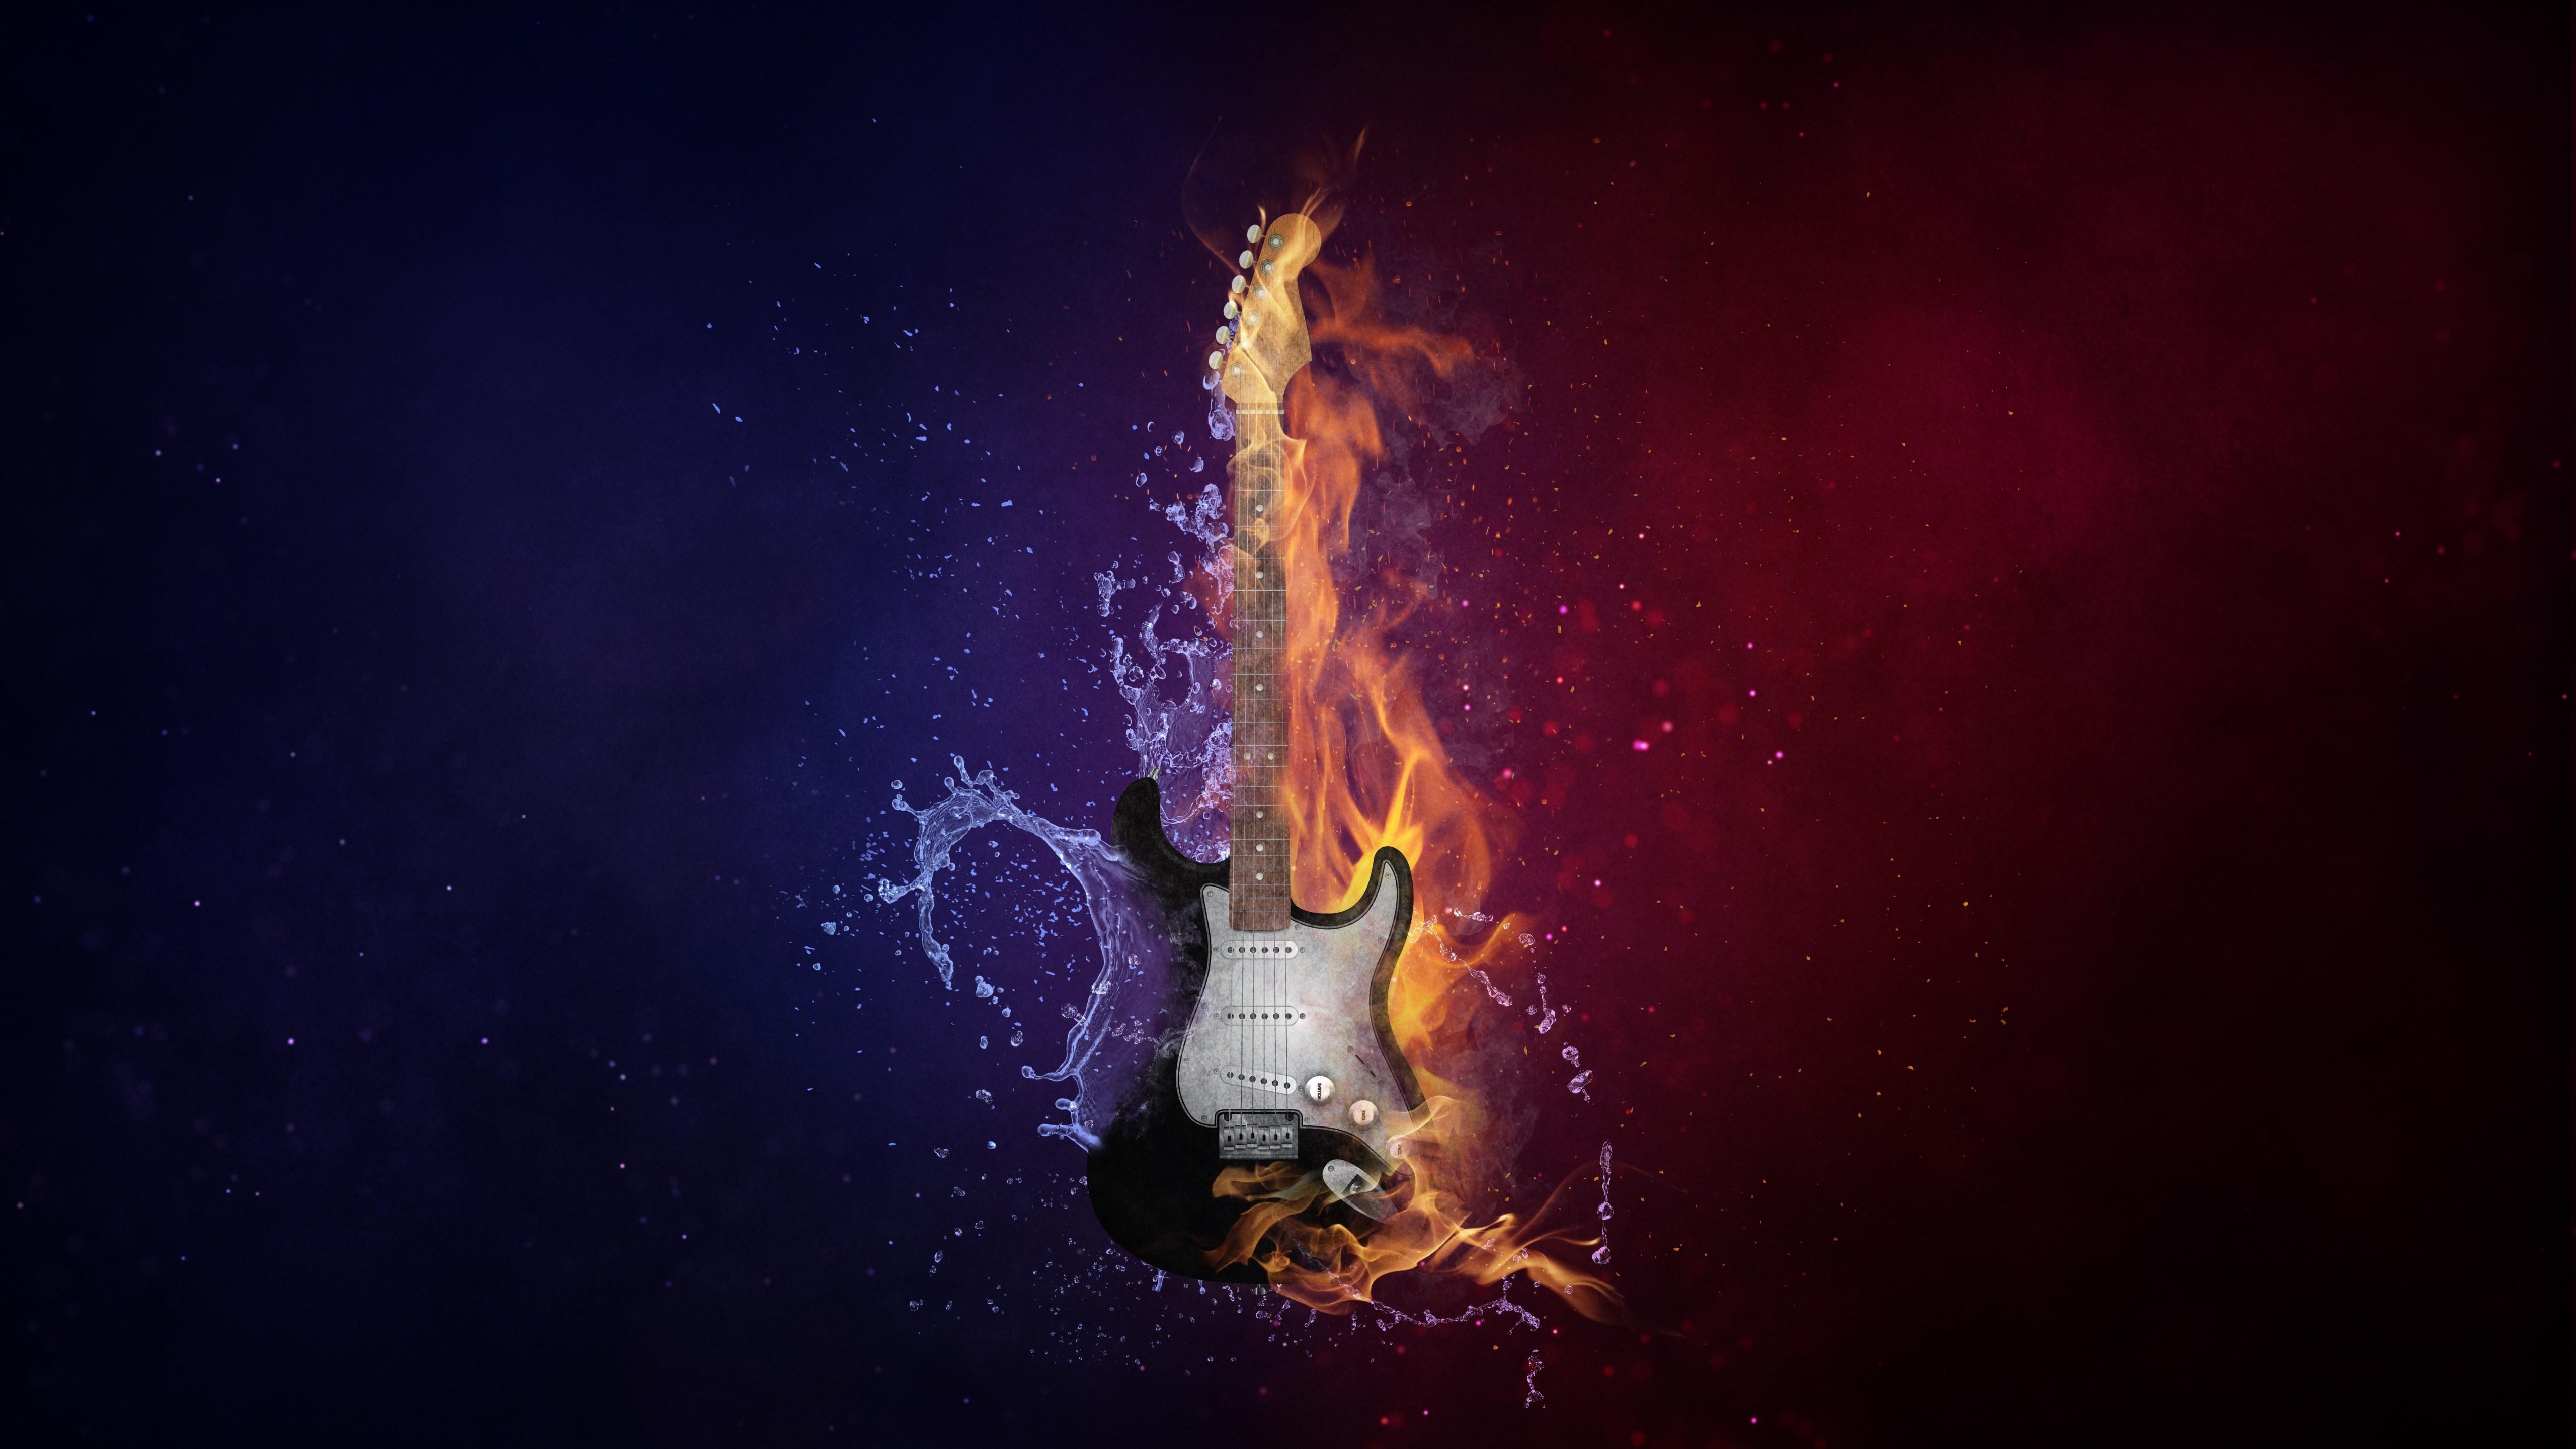 Guitar in water & fire wallpaper - backiee